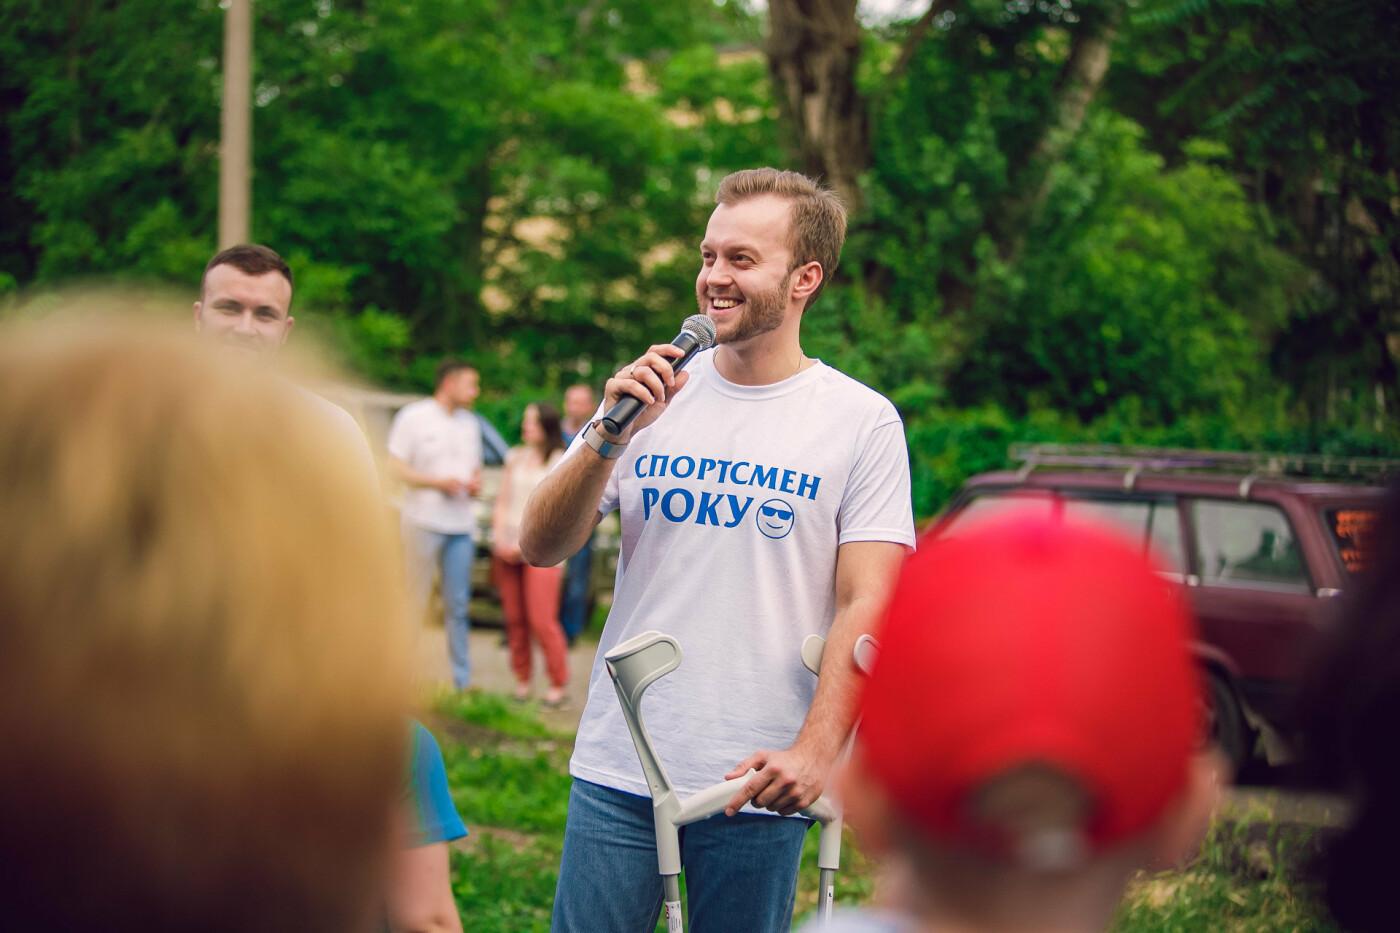 «Спасибо», – ОСМД «Муравейник» в Кривом Роге поблагодарило депутата Усова за спортивную площадку в их дворе, фото-2